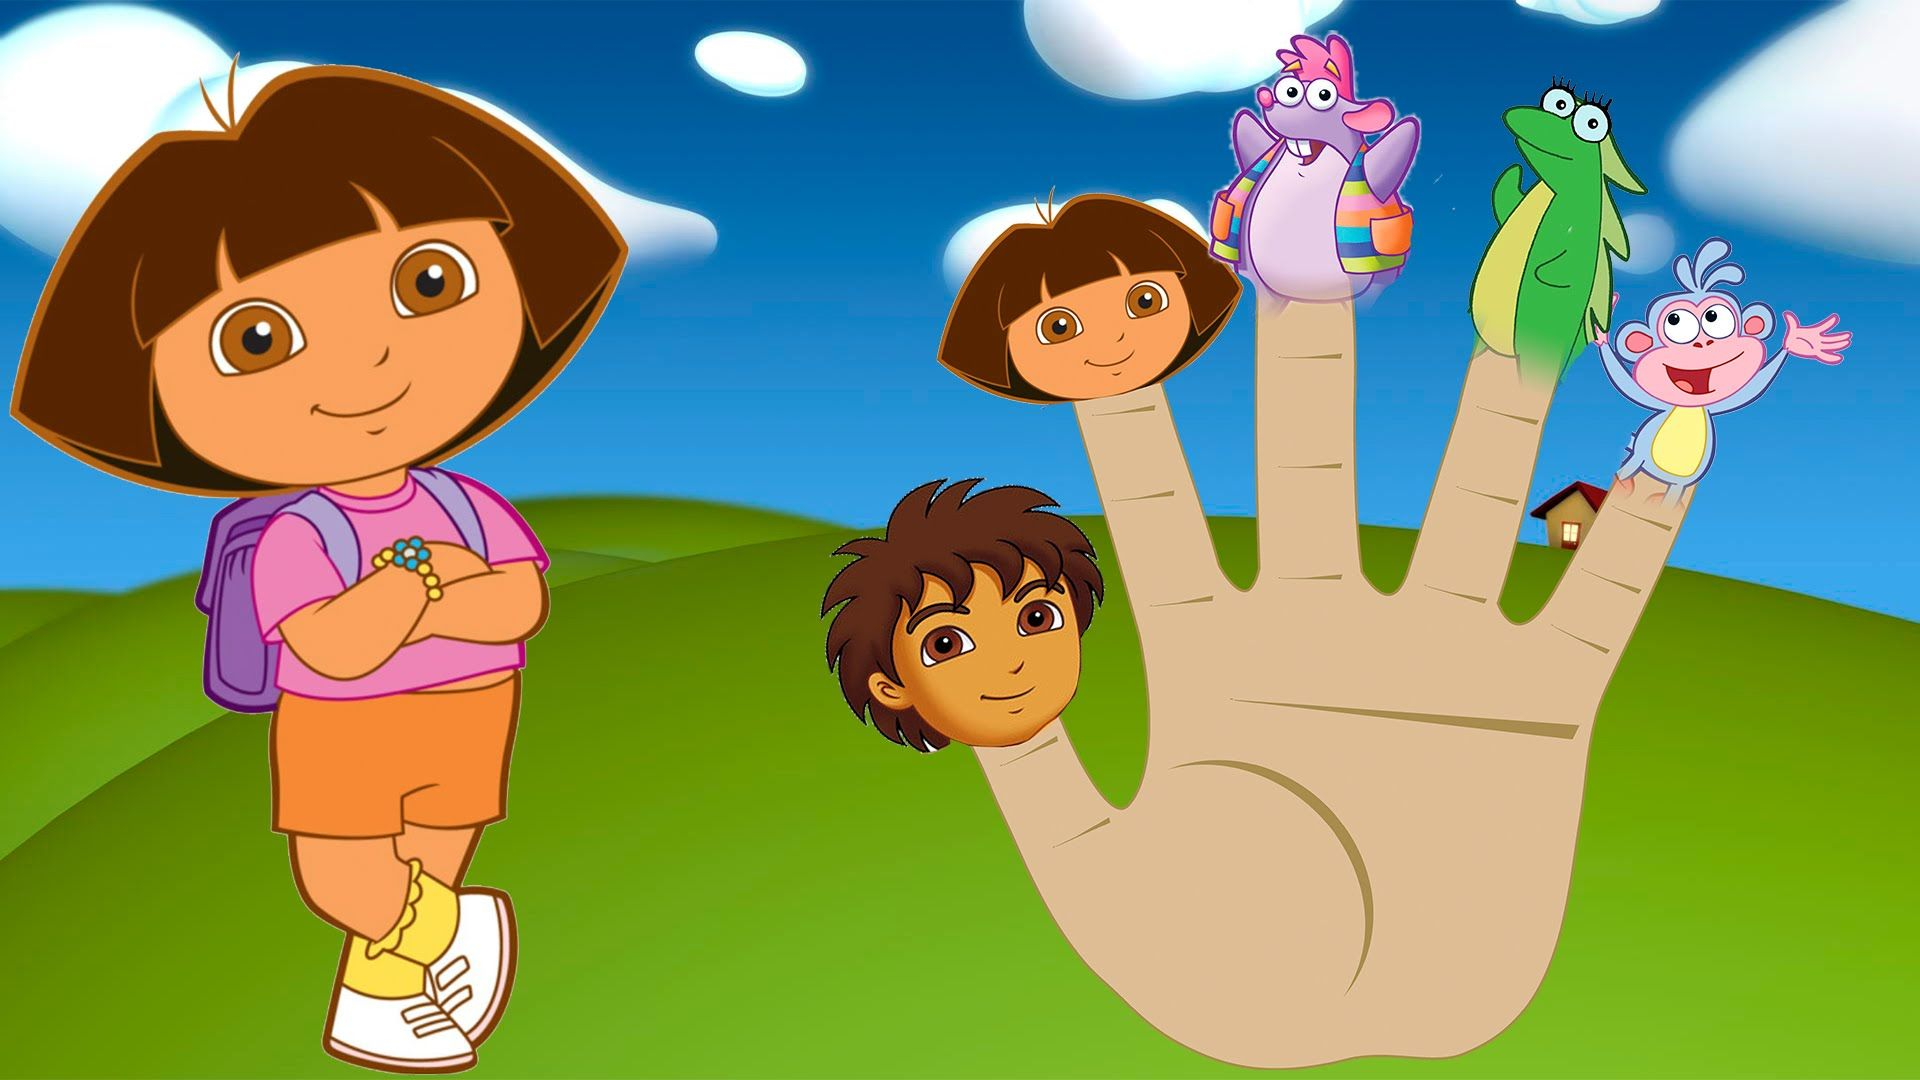 Dora picture image